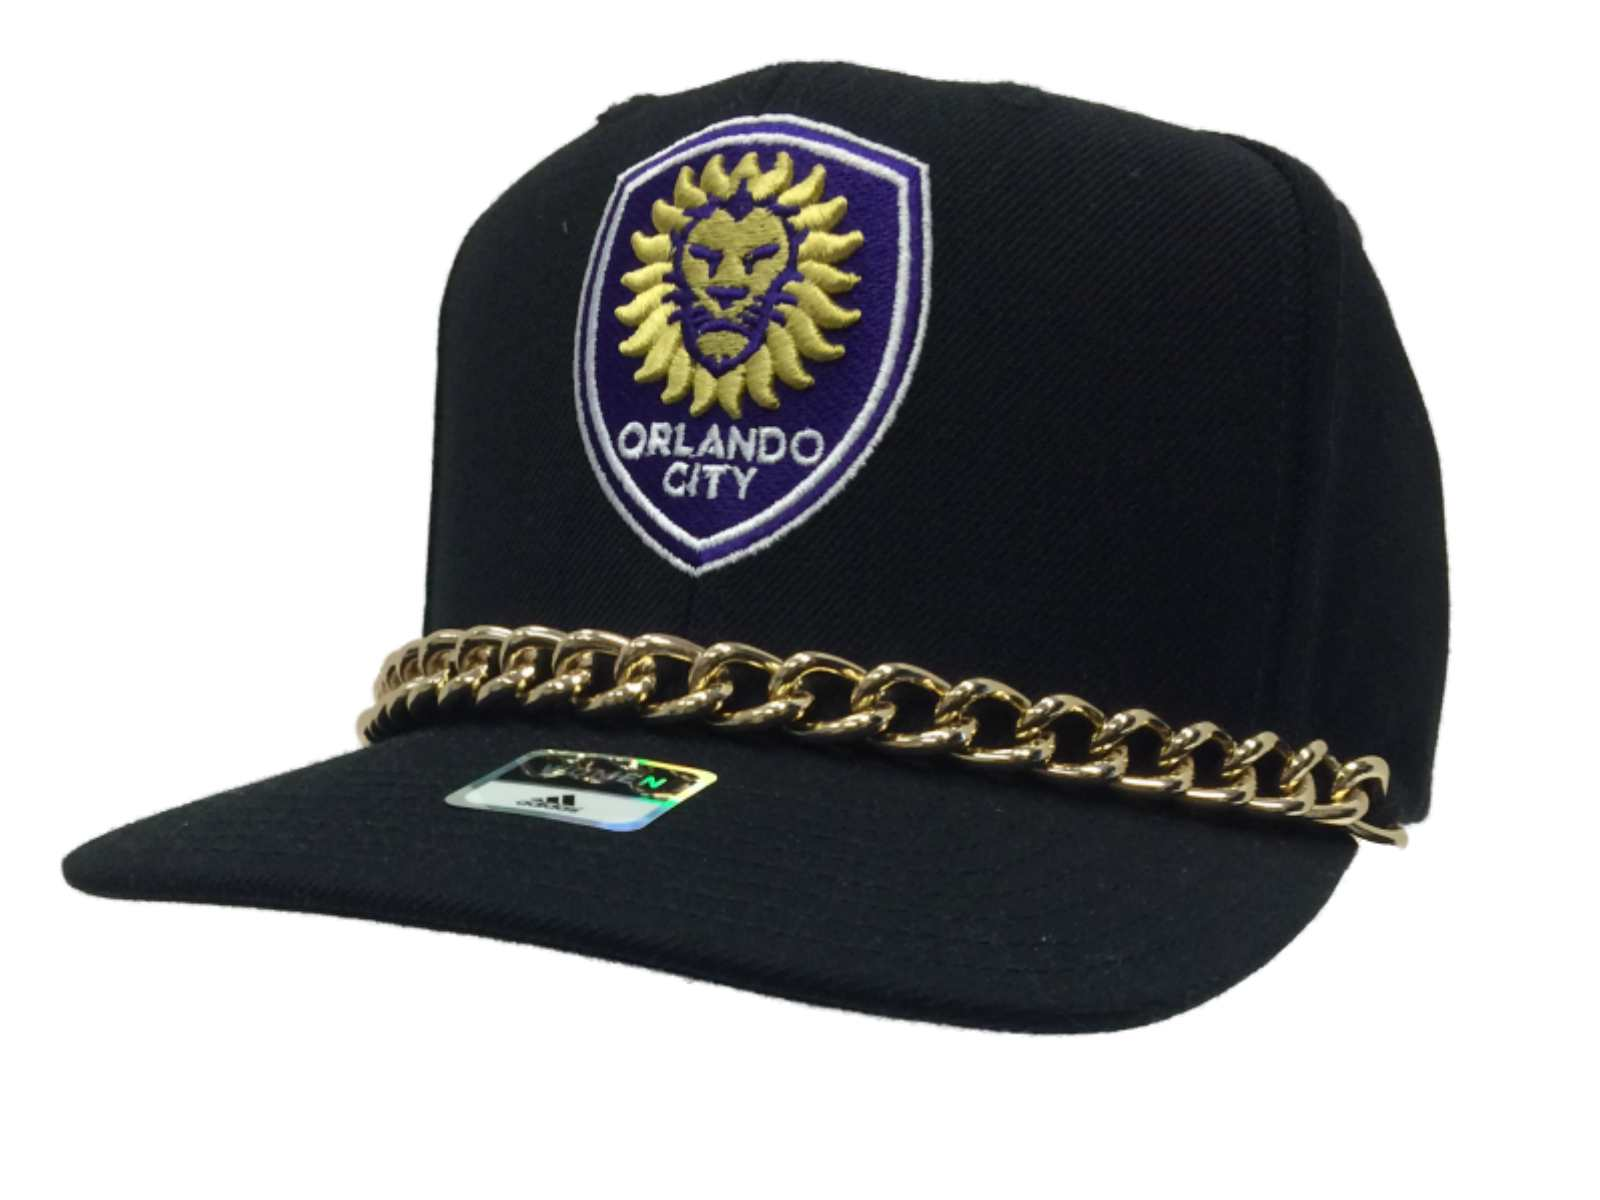 b76268aa205 Orlando City SC Adidas WOMEN Black with Chain Snapback Flat Bill Hat ...